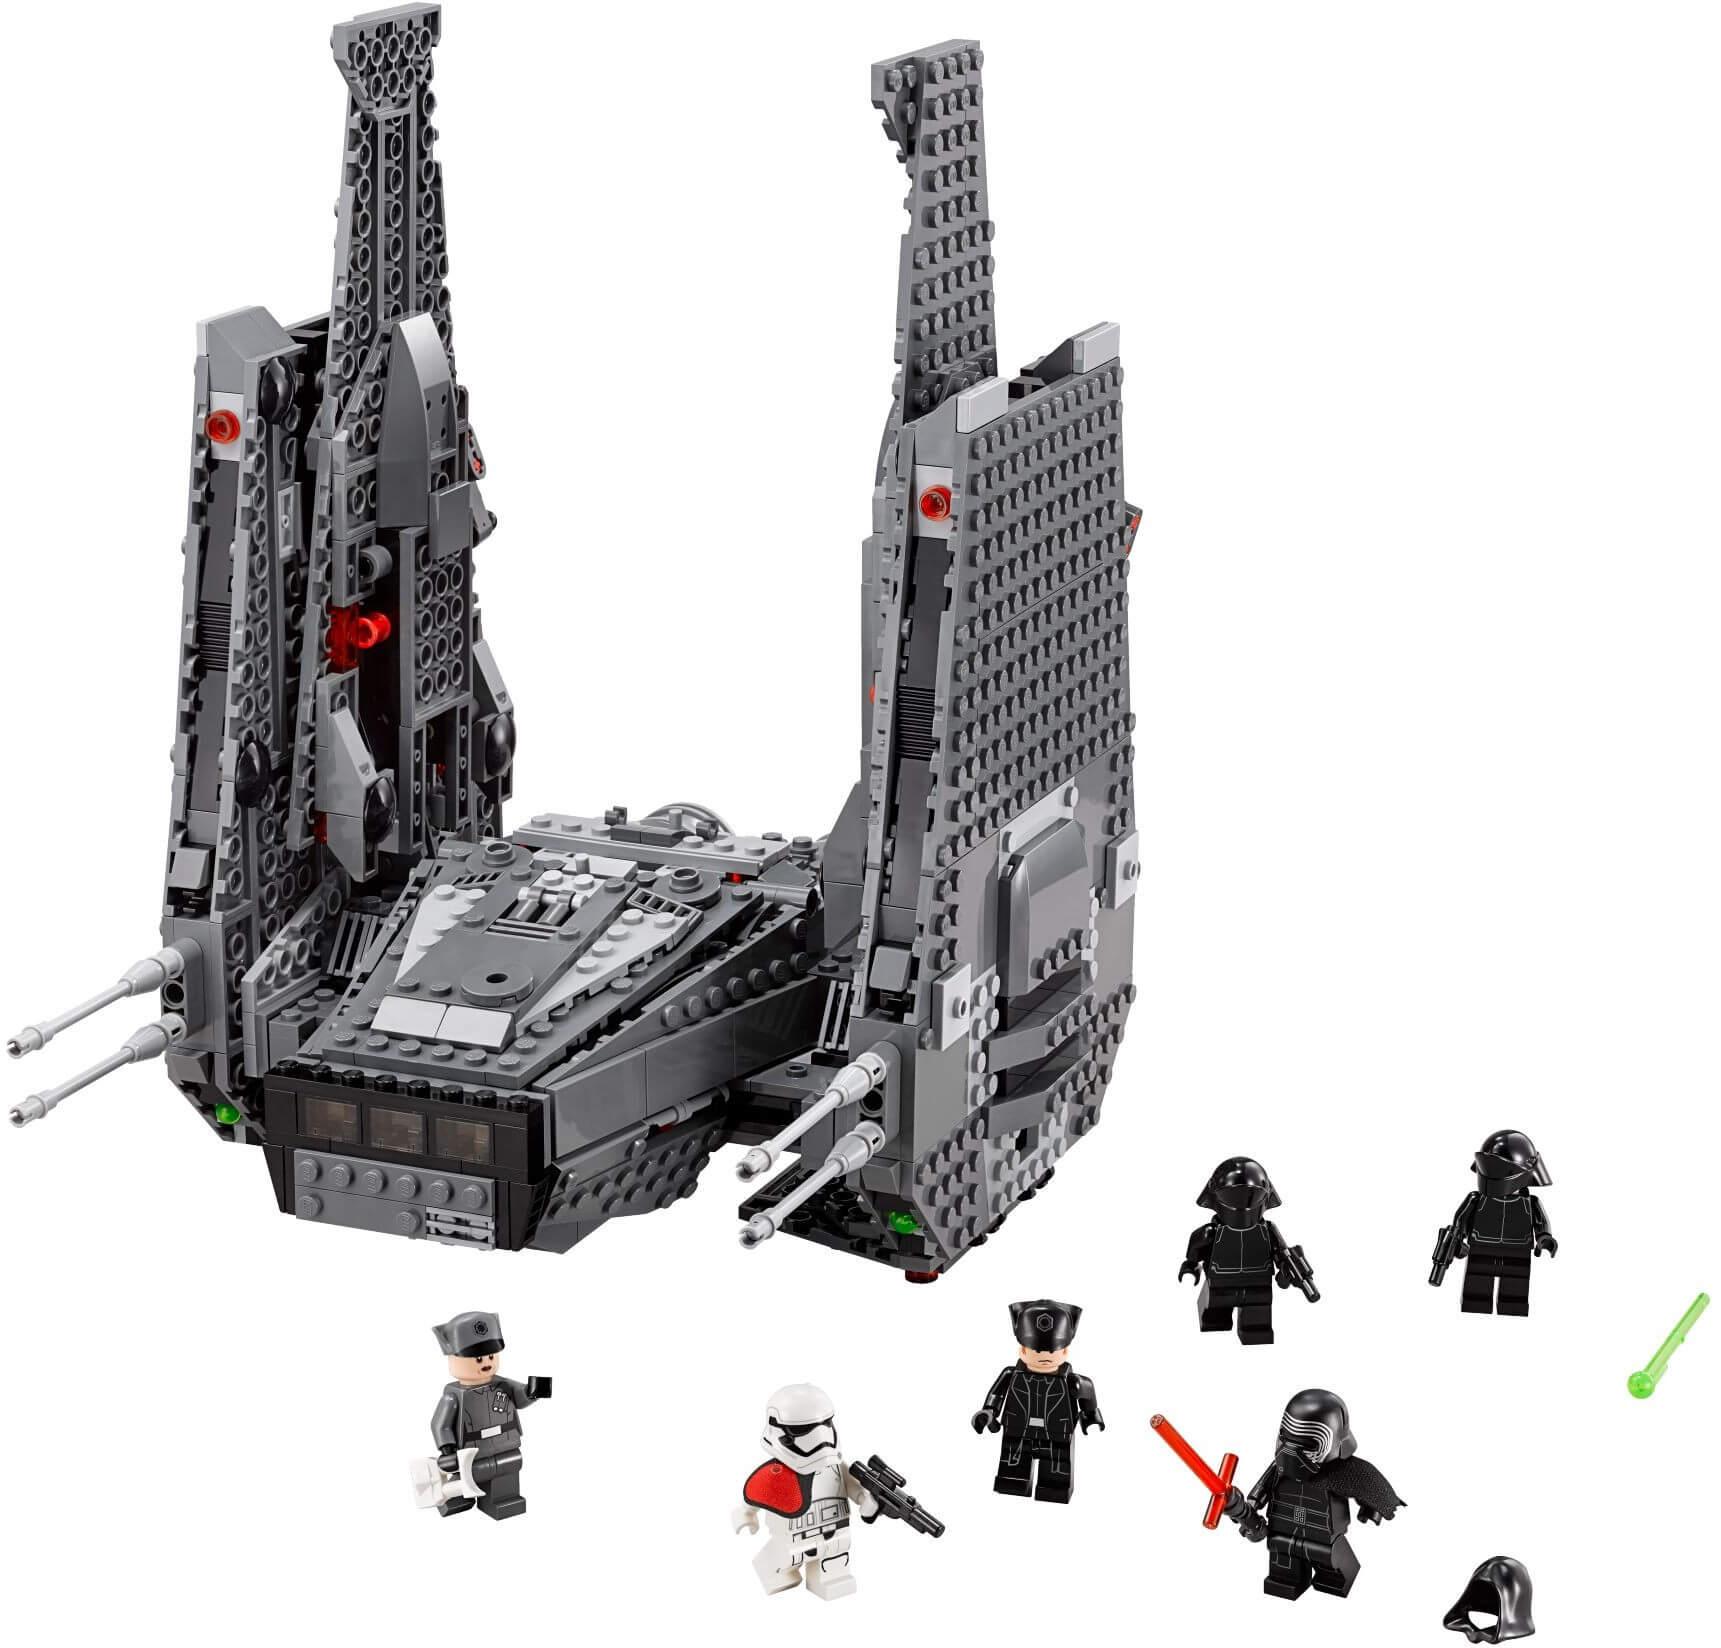 Mua đồ chơi LEGO 75104 - LEGO Star Wars 75104 - Phi thuyền chỉ huy của Kylo Ren (LEGO Star Wars Kylo Ren's Command Shuttle 75104)